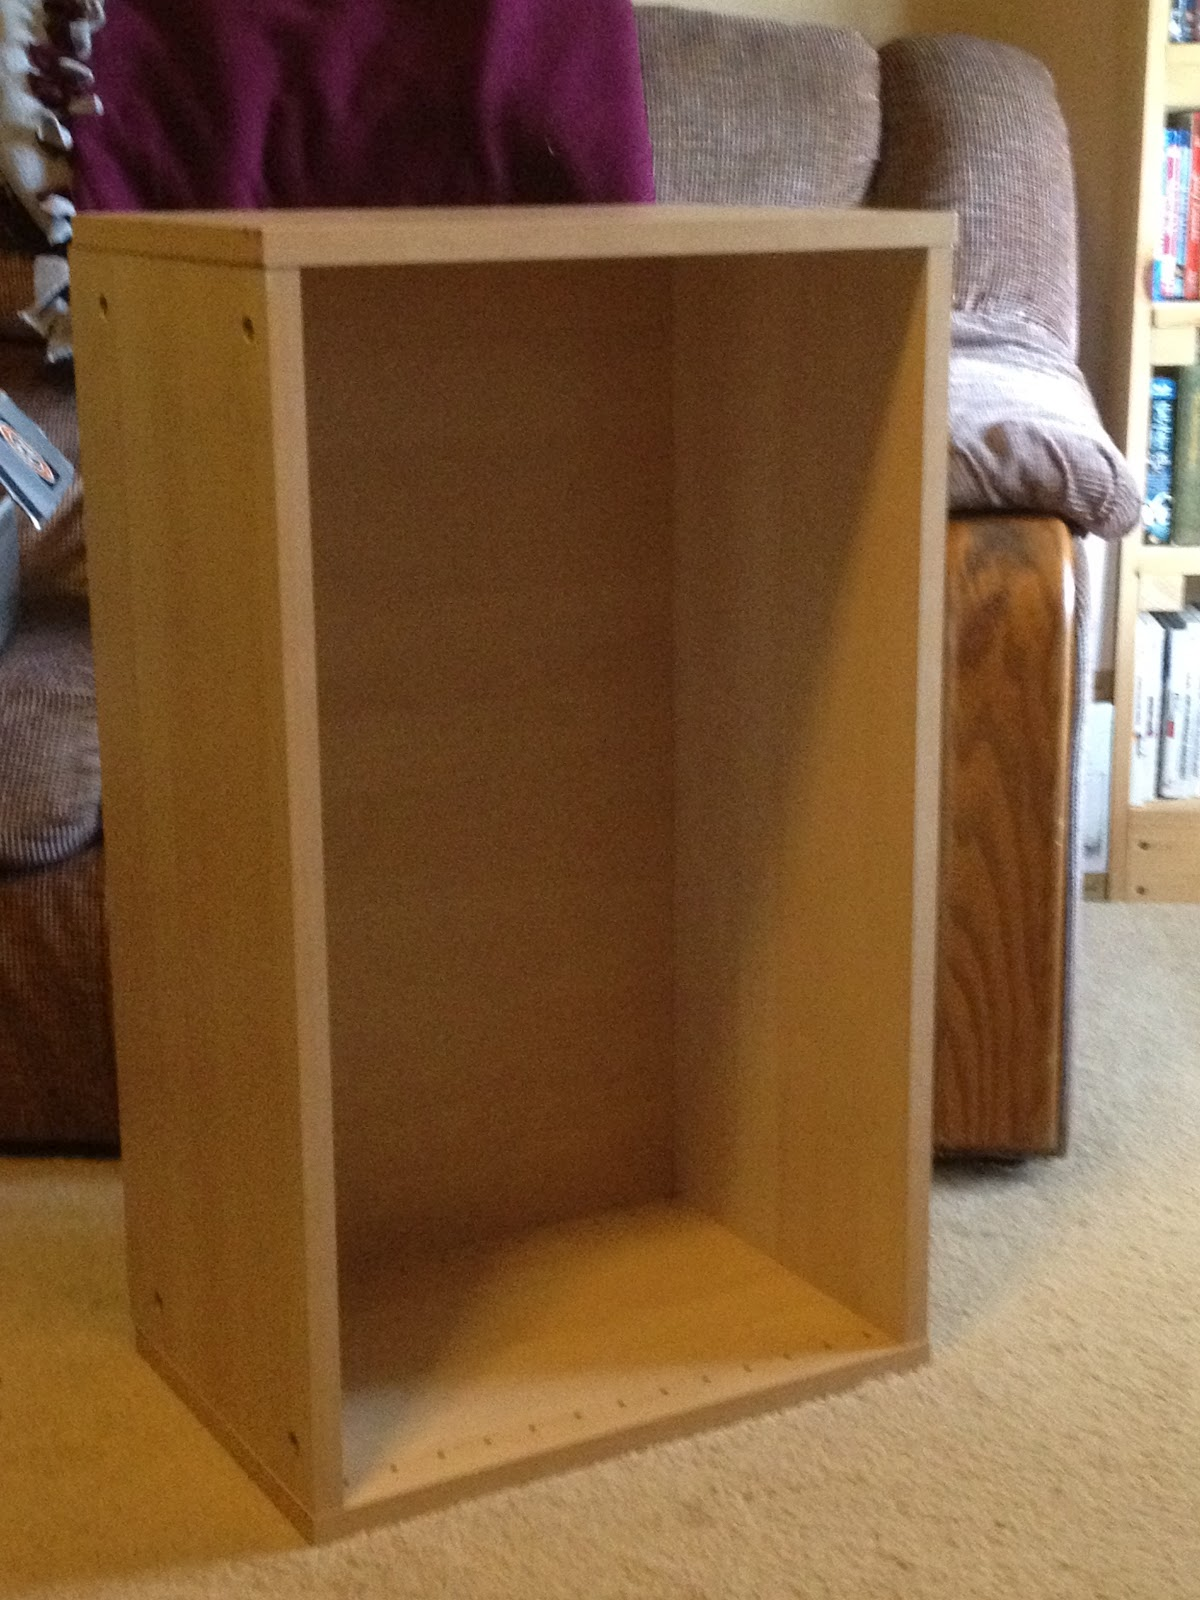 sadie lady ikea hack storage bench. Black Bedroom Furniture Sets. Home Design Ideas